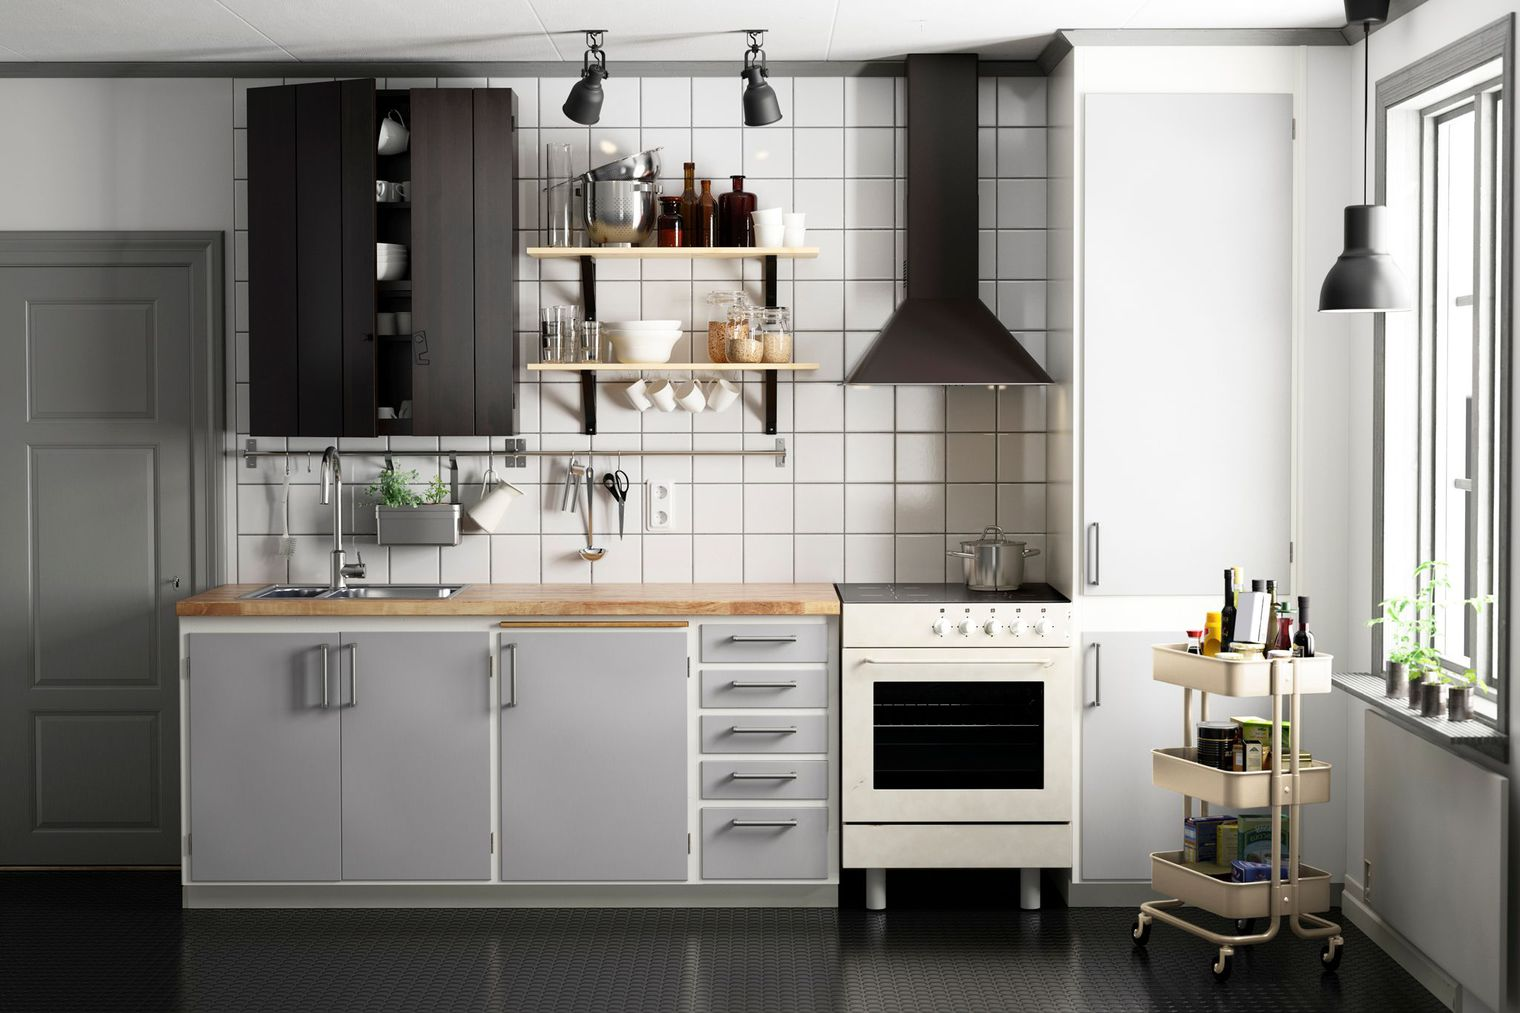 10 meilleures astuces gain de place pour une petite cuisine - Ikea petite cuisine ...